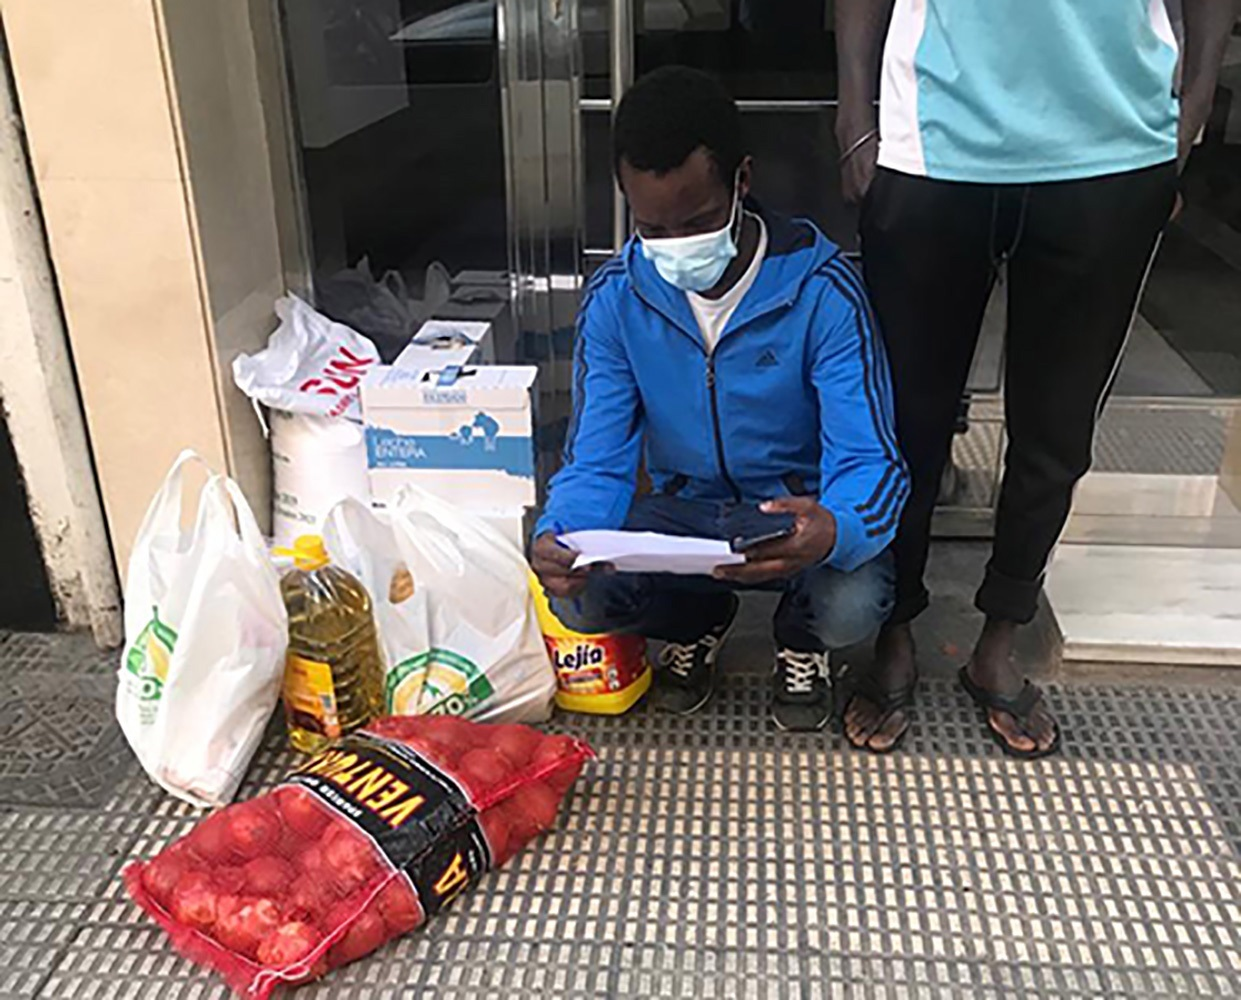 Imagen facilitada por Mohamed Soumare (i), presidente de la Asociación de Inmigrantes Senegaleses de Aragón (AISA) durante la entrega de lotes de comida que reparte entre 62 familias vulnerables. EFE/Mohamed Soumare